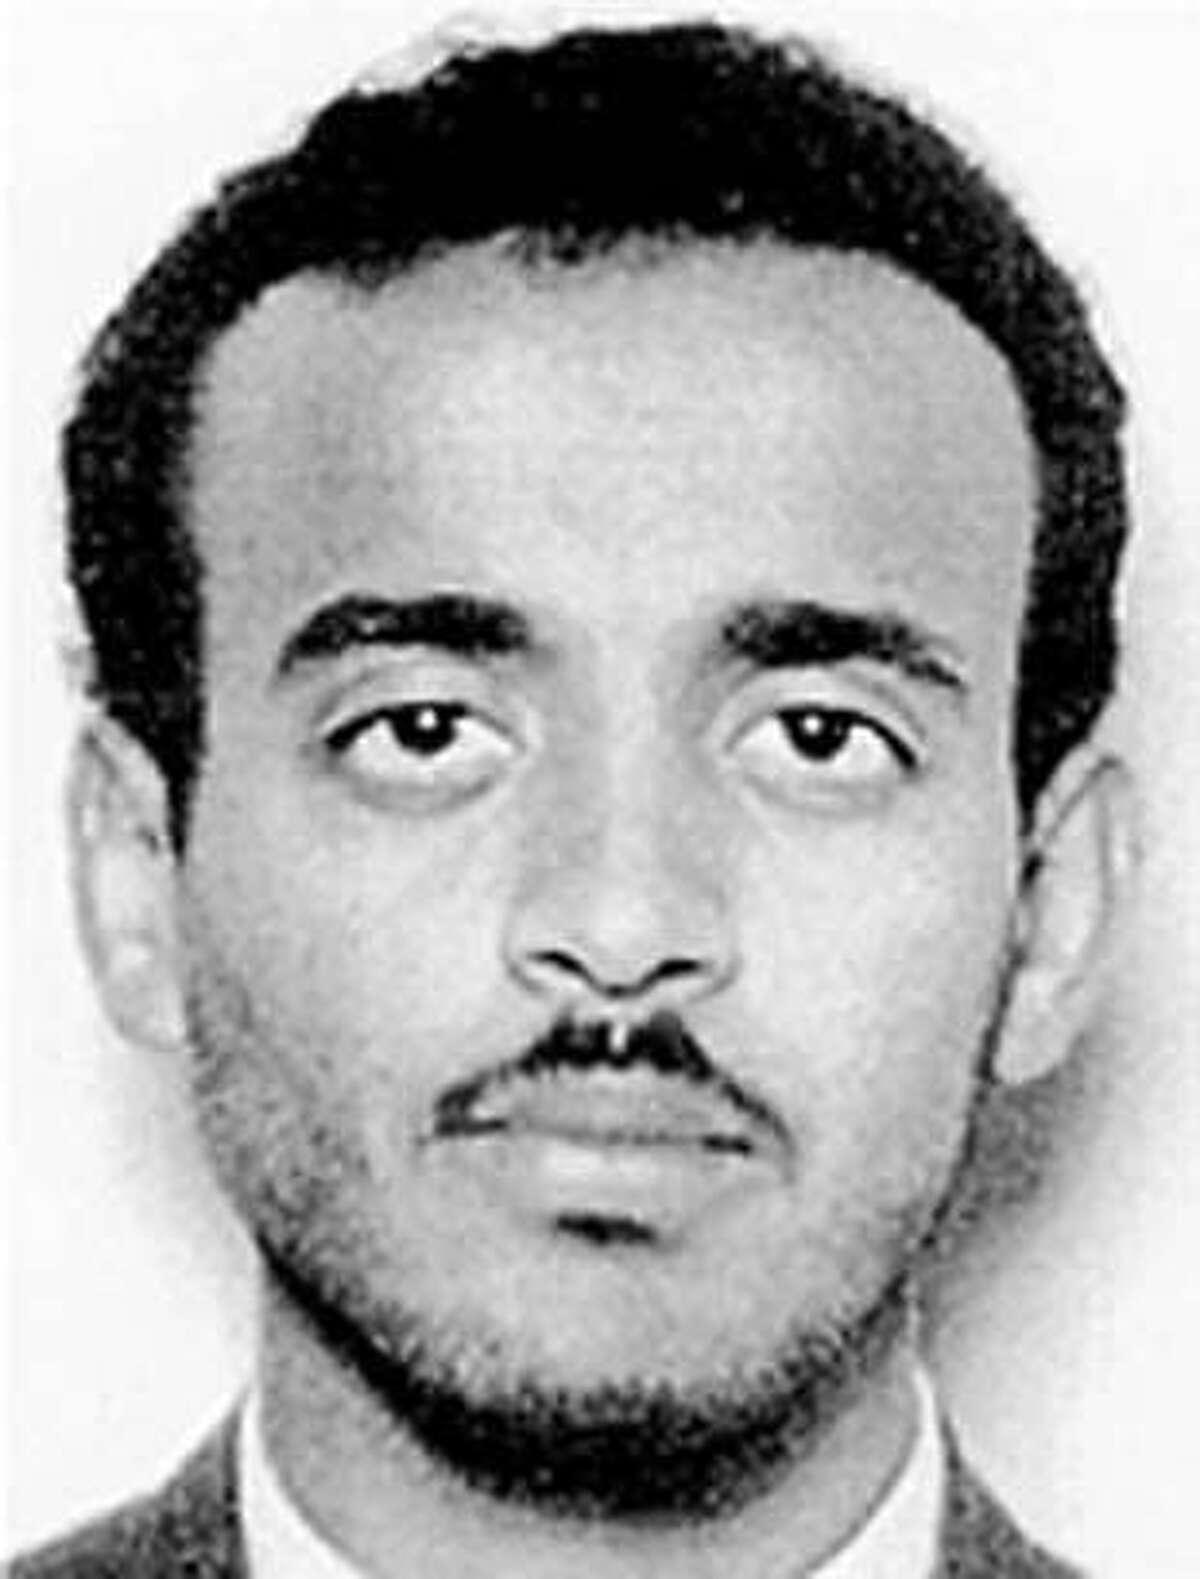 Ramzi bin Al-Shibh CAT